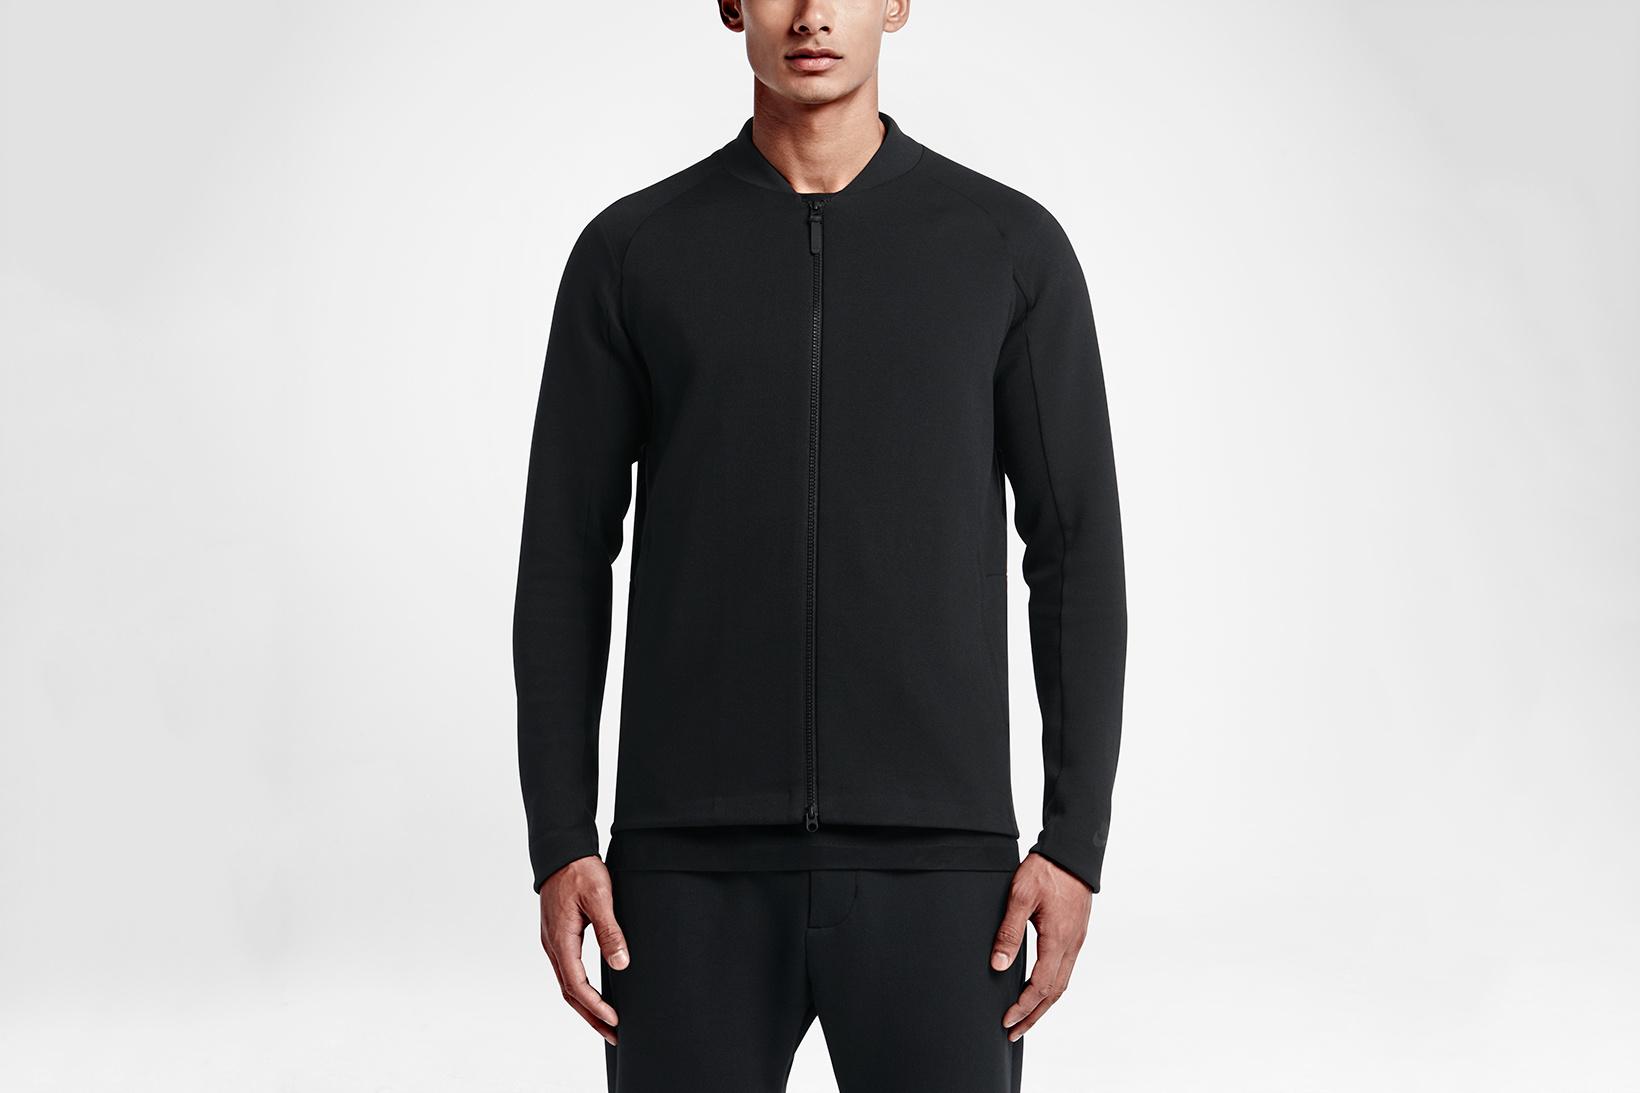 nikelab-transform-jacket-3